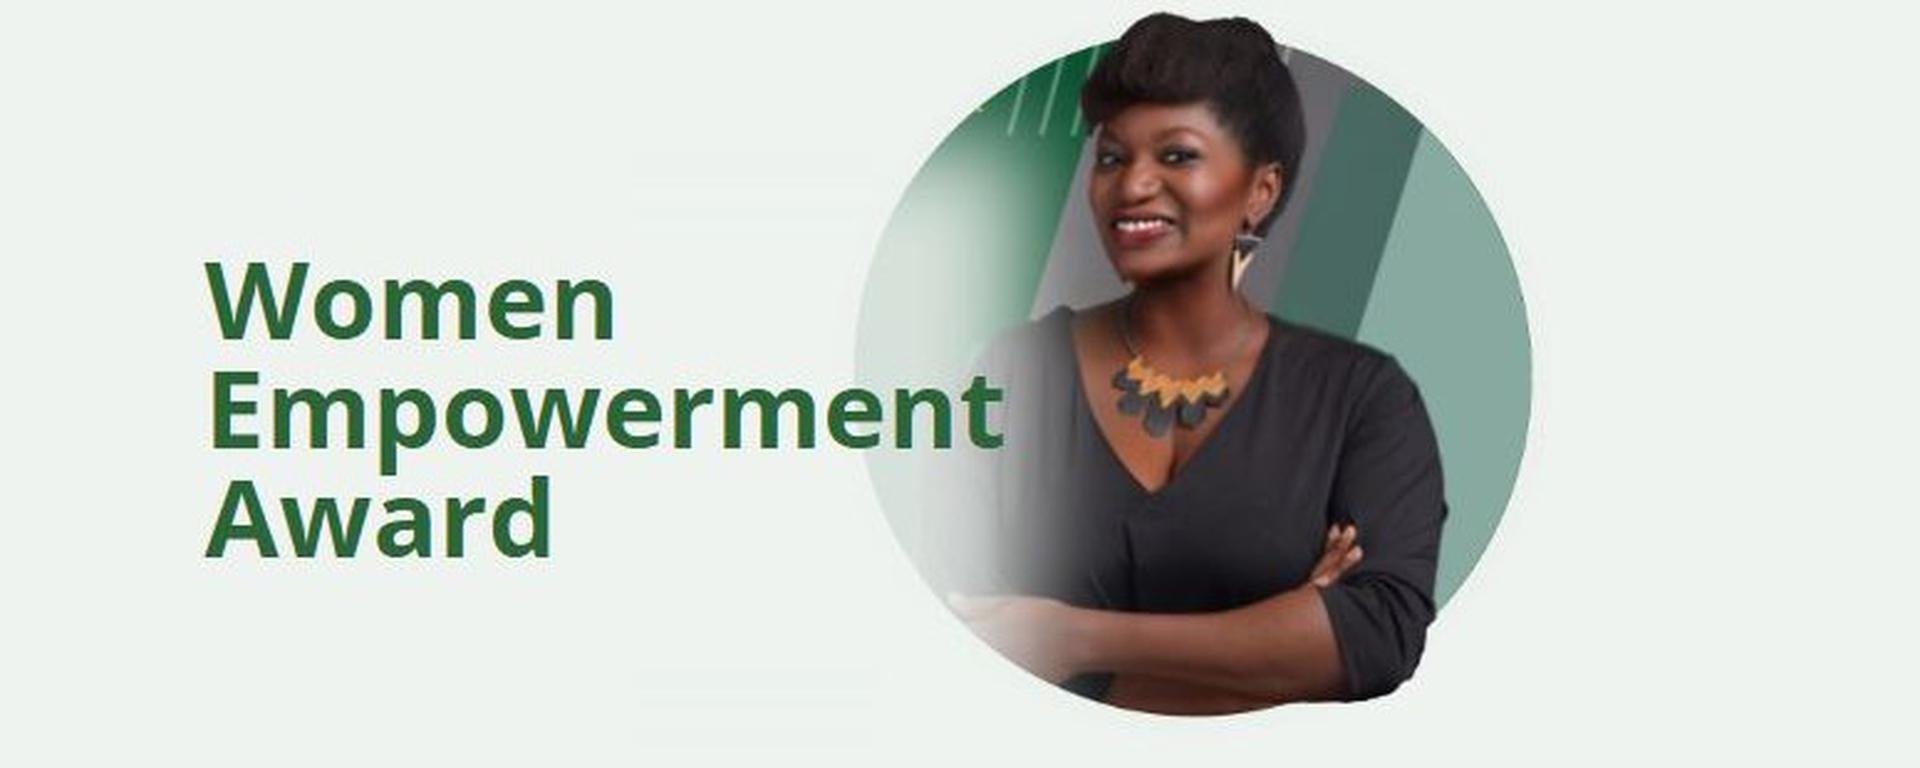 Bayer Foundation - Women Empowerment Award Movemeback African initiative cover image